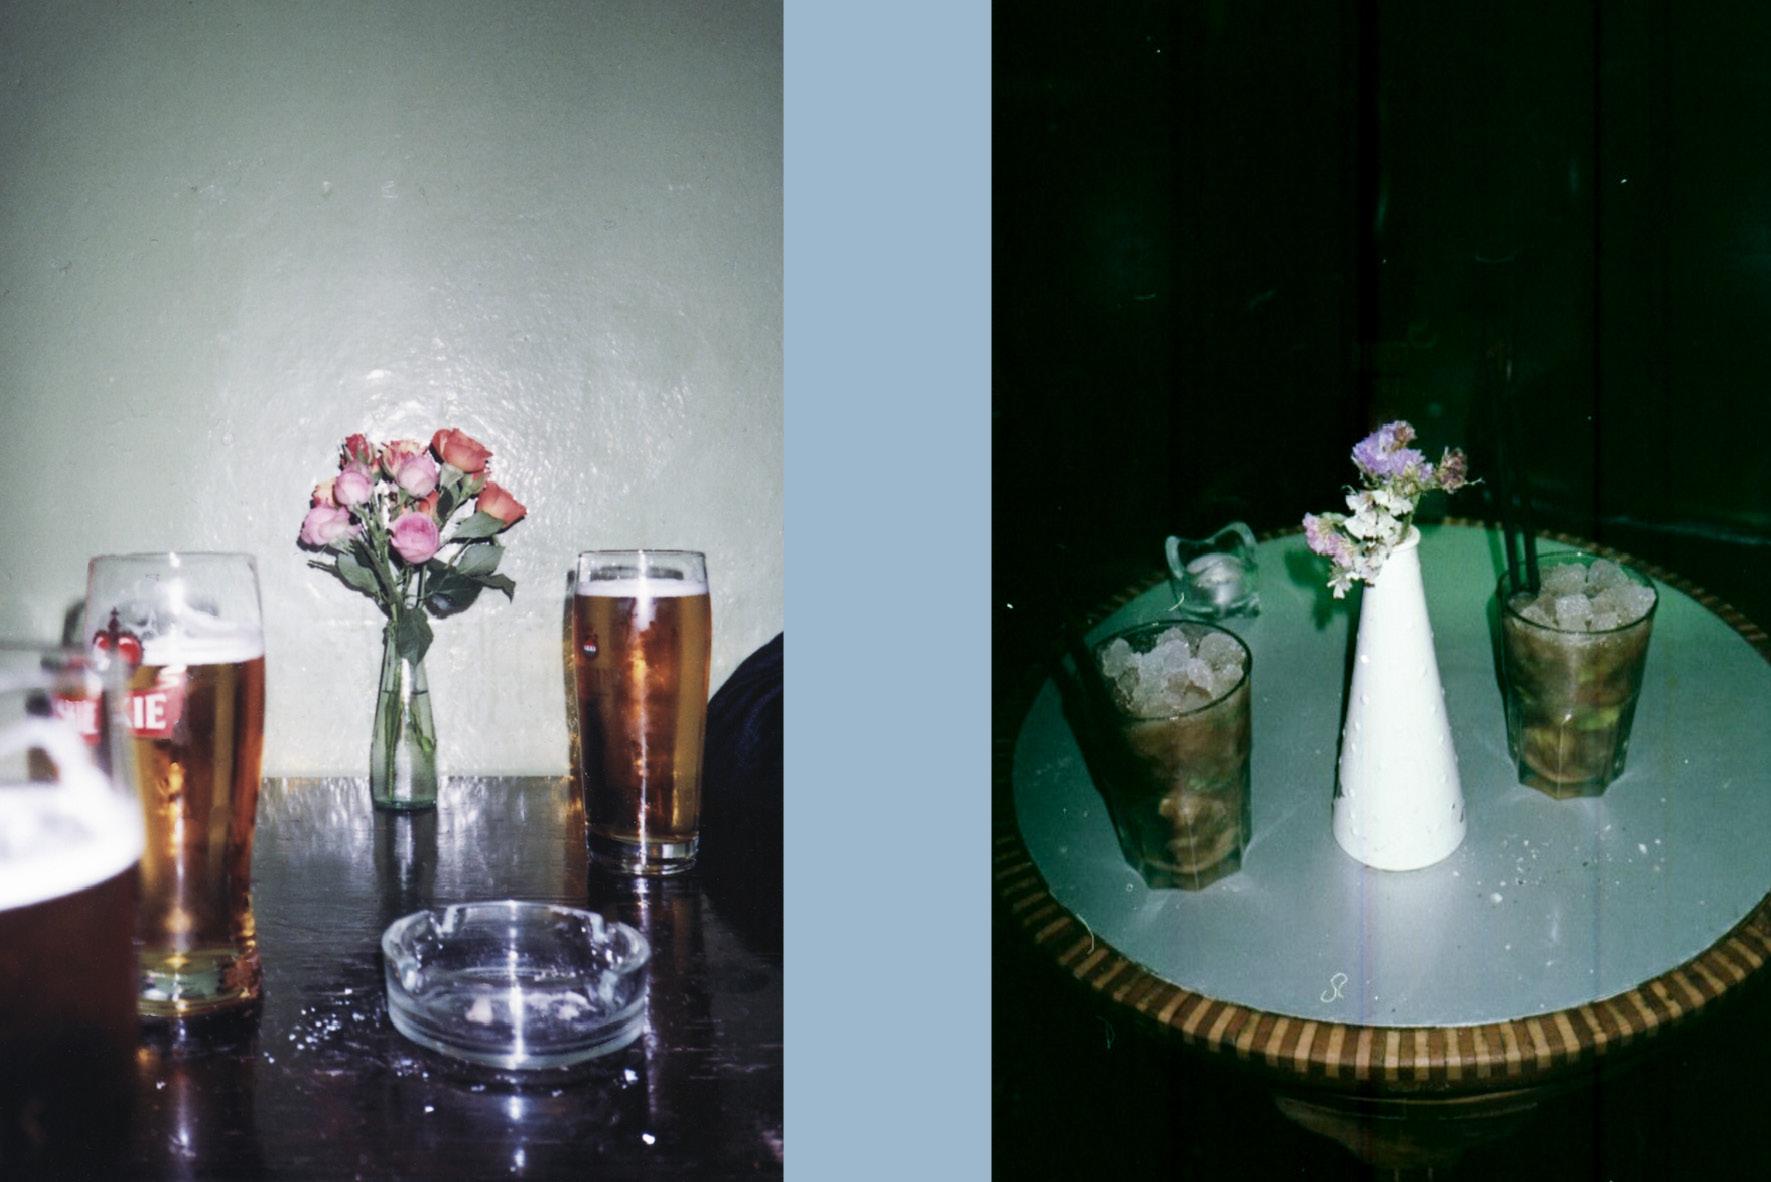 PLACE_kaffeezigarette_partyblumen9